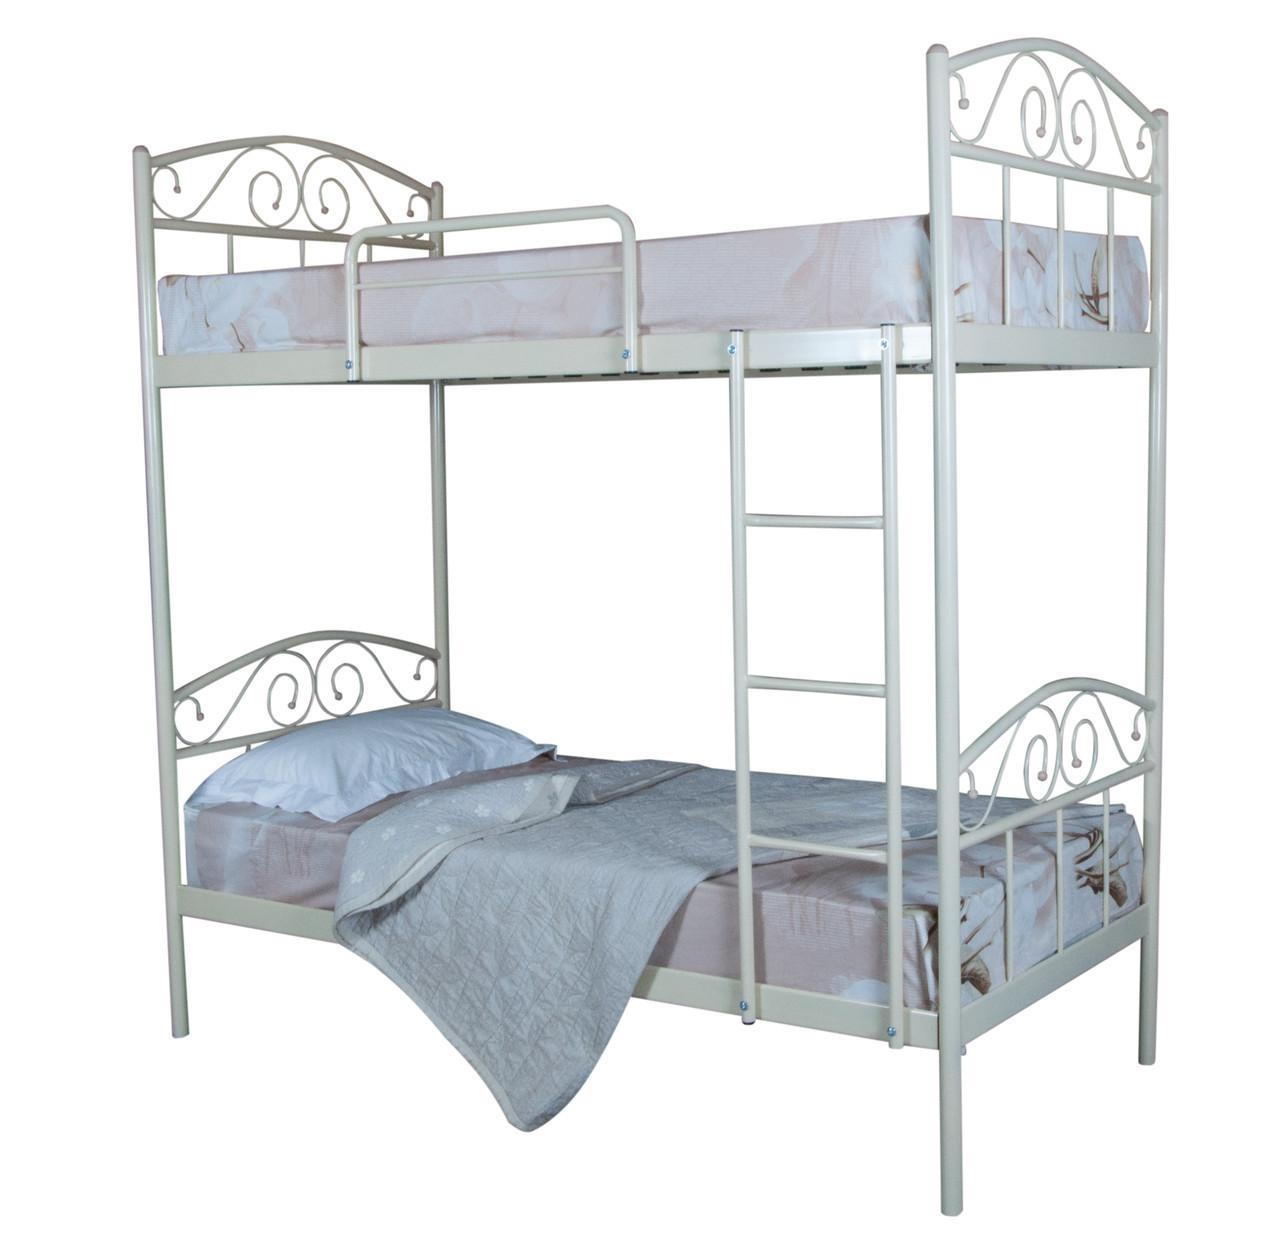 Кровать Элис Люкс двухъярусная 200х90, розовая